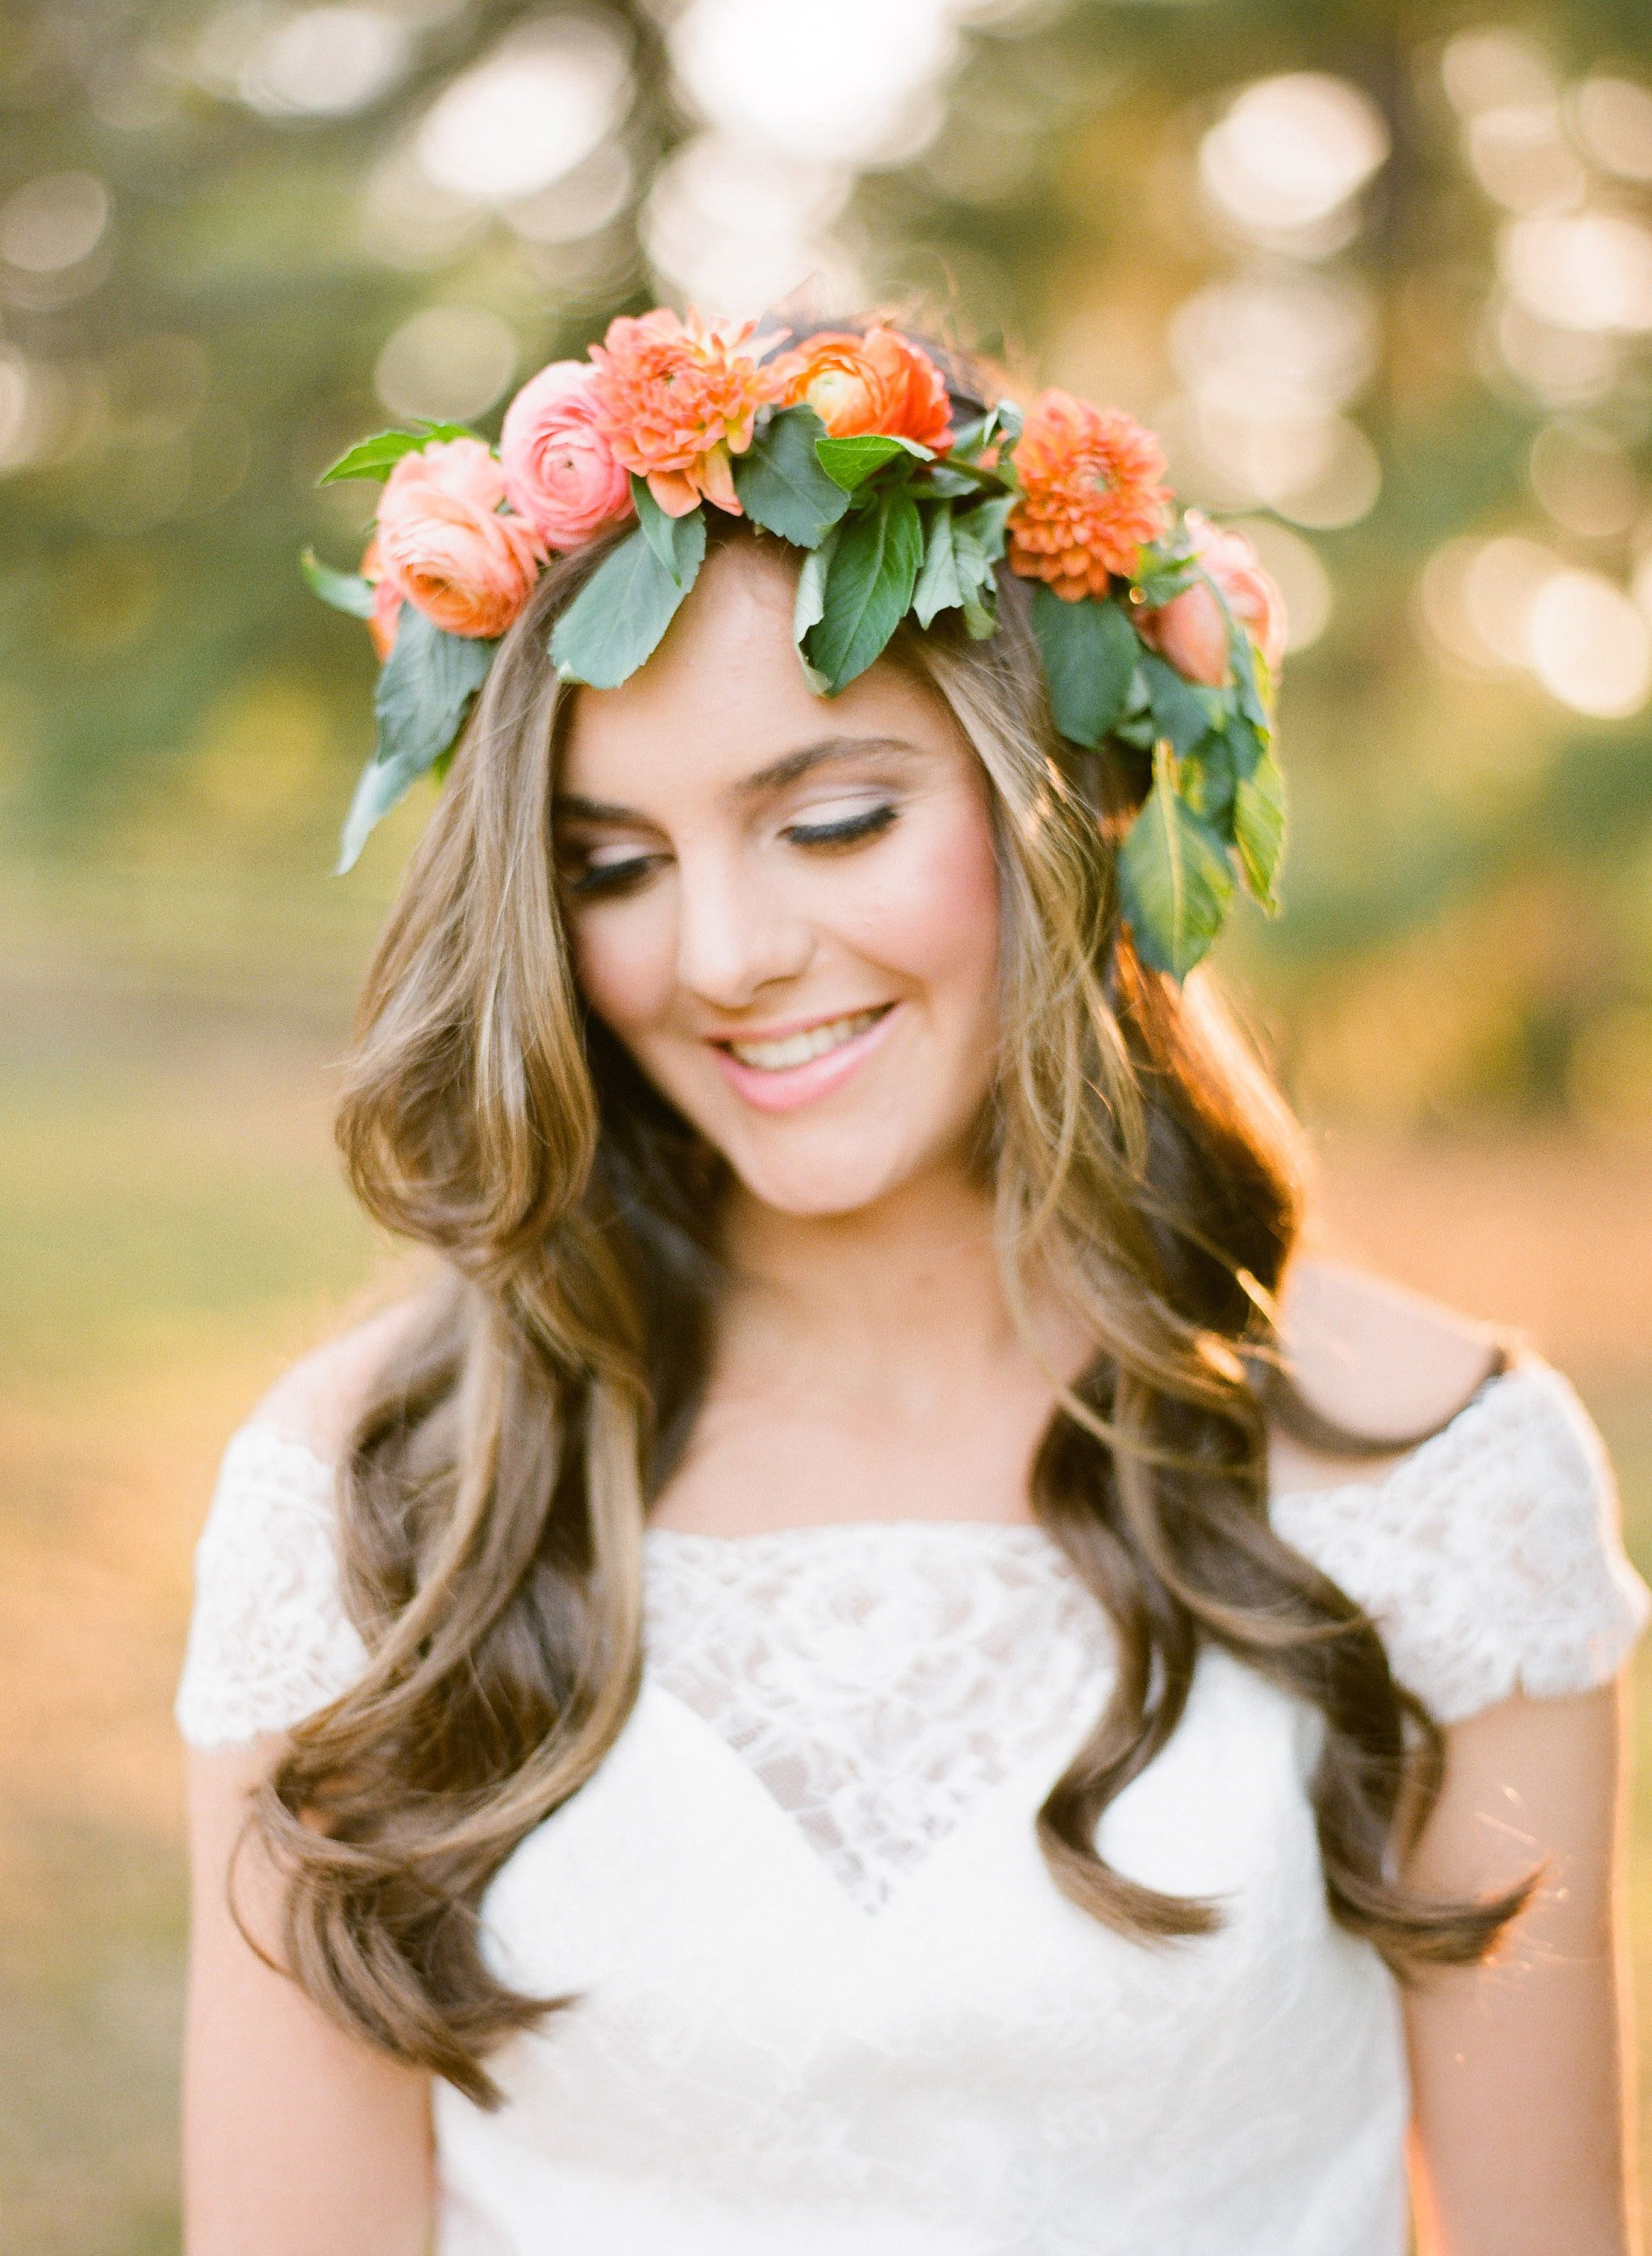 Resultado de imagem para bride hair loose flower